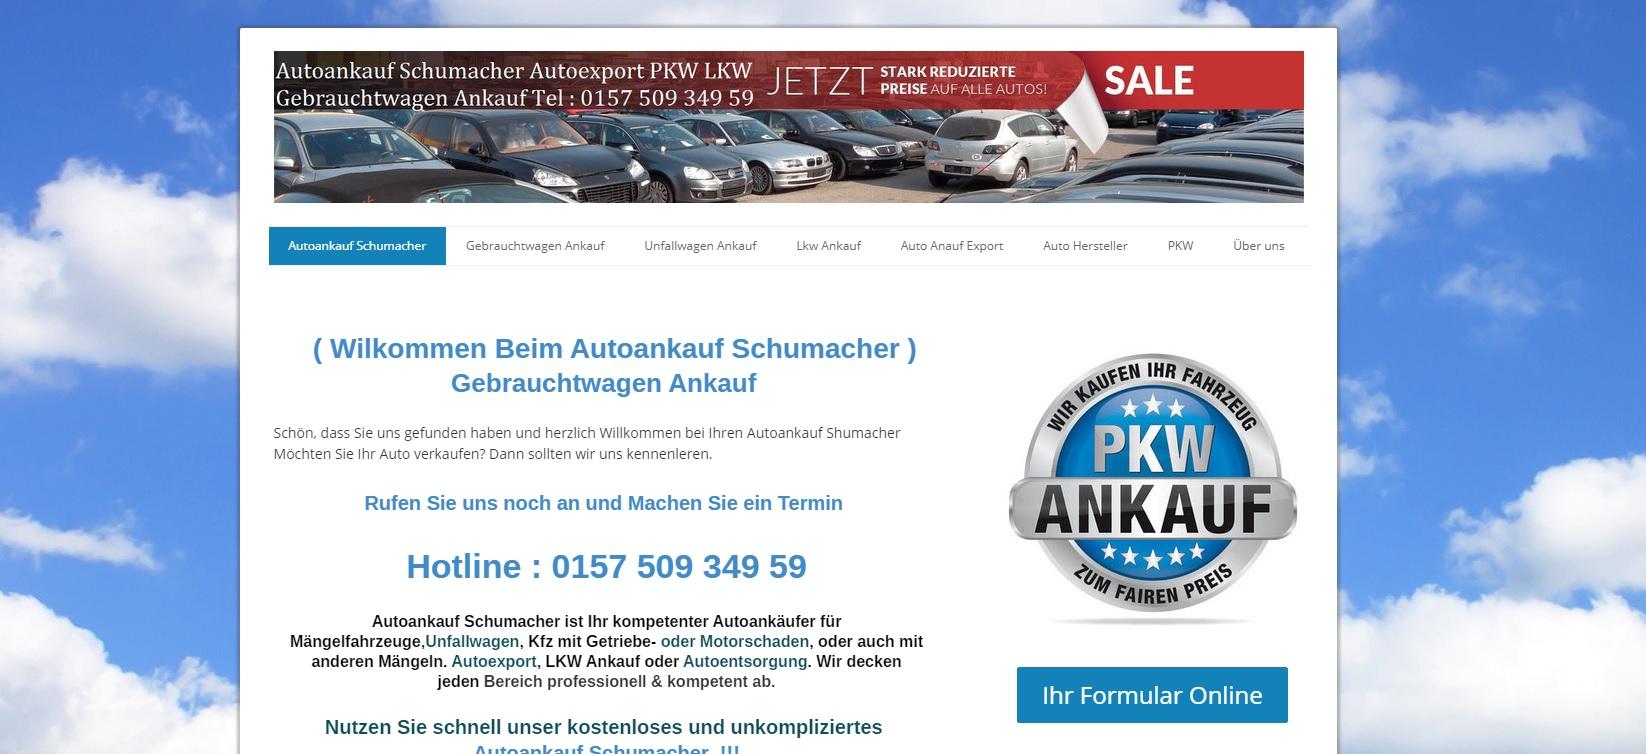 autoankauf-schumacher.de - Autoankauf Konstanz